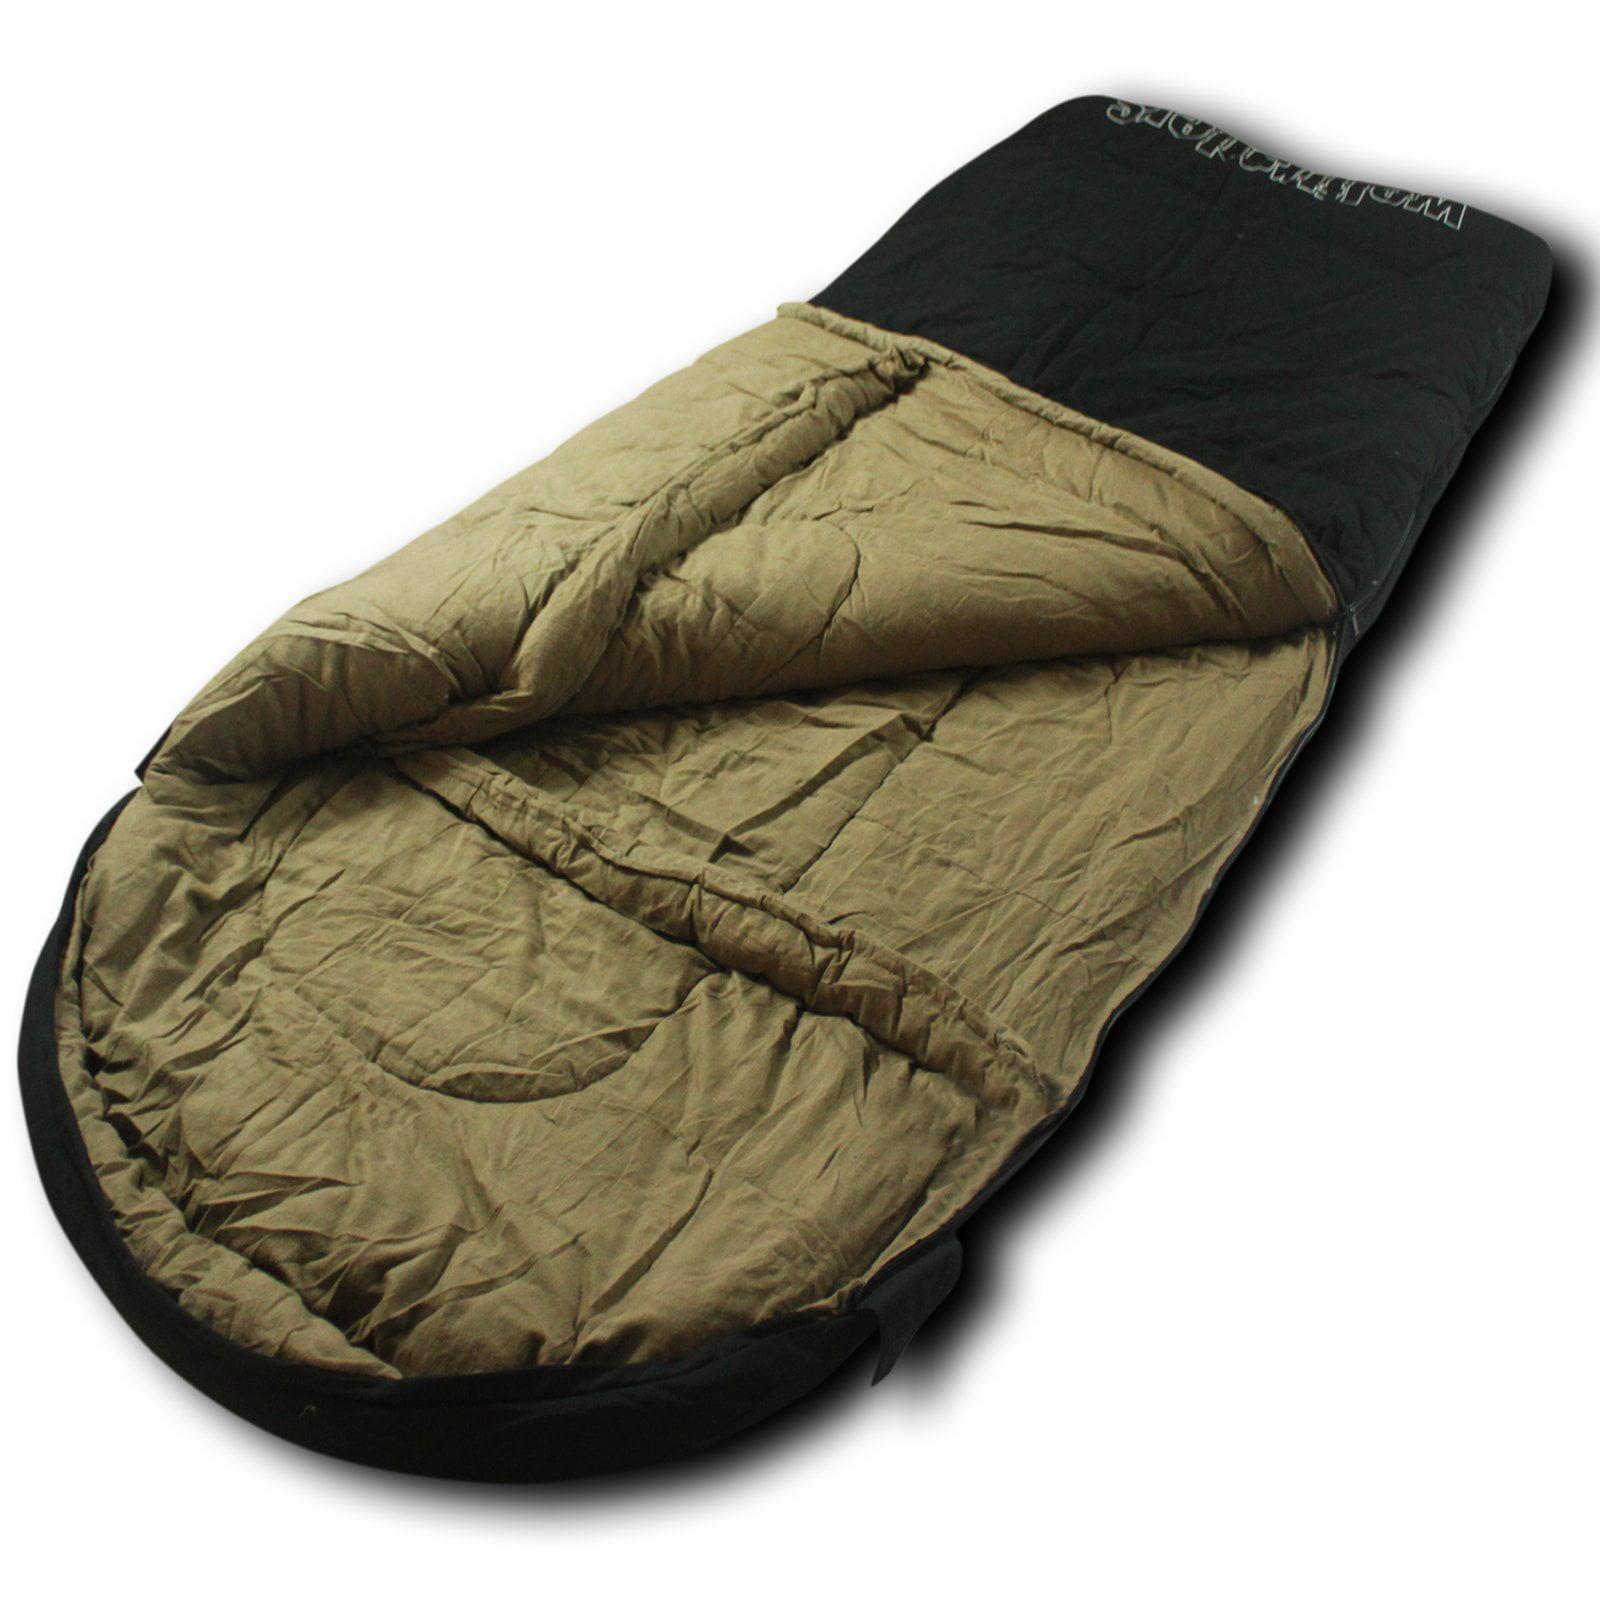 Wolftraders LoneWolf -30 Degree Premium Canvas Oversized Square Sleeping Bag, Black/Tan